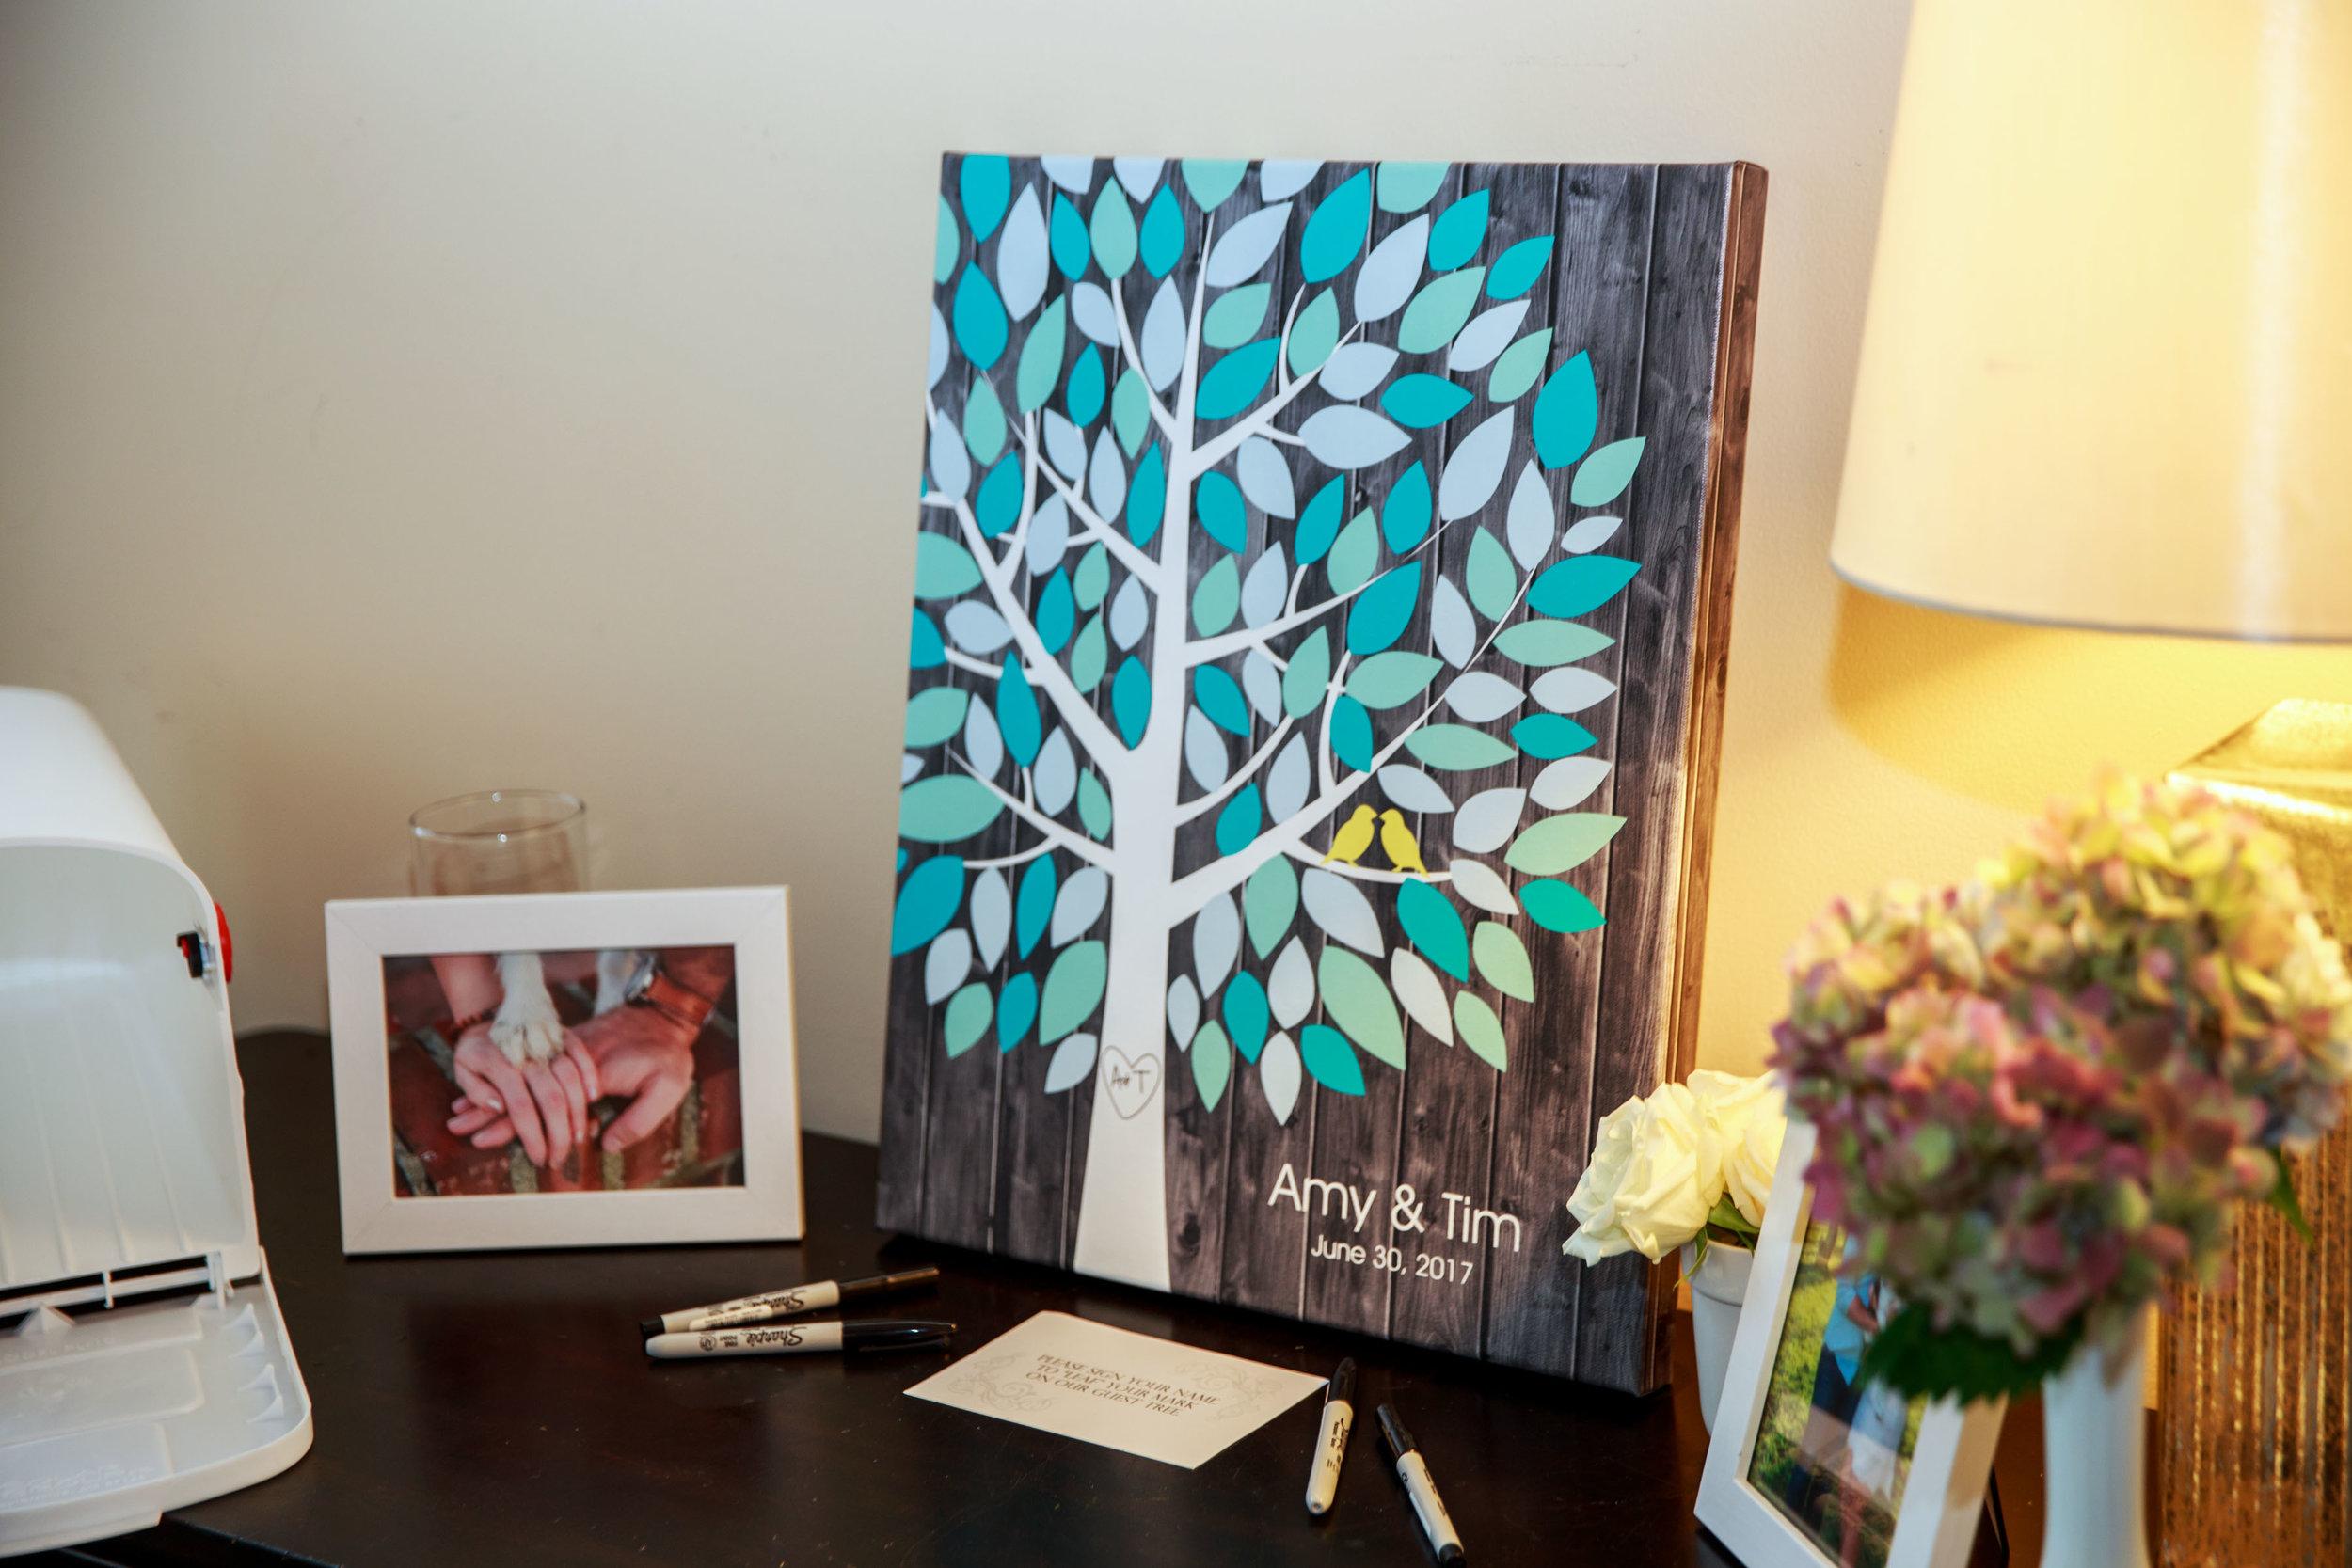 128-South-Wedding-Tiffany-Abruzzo-Photography-Details-28.jpg